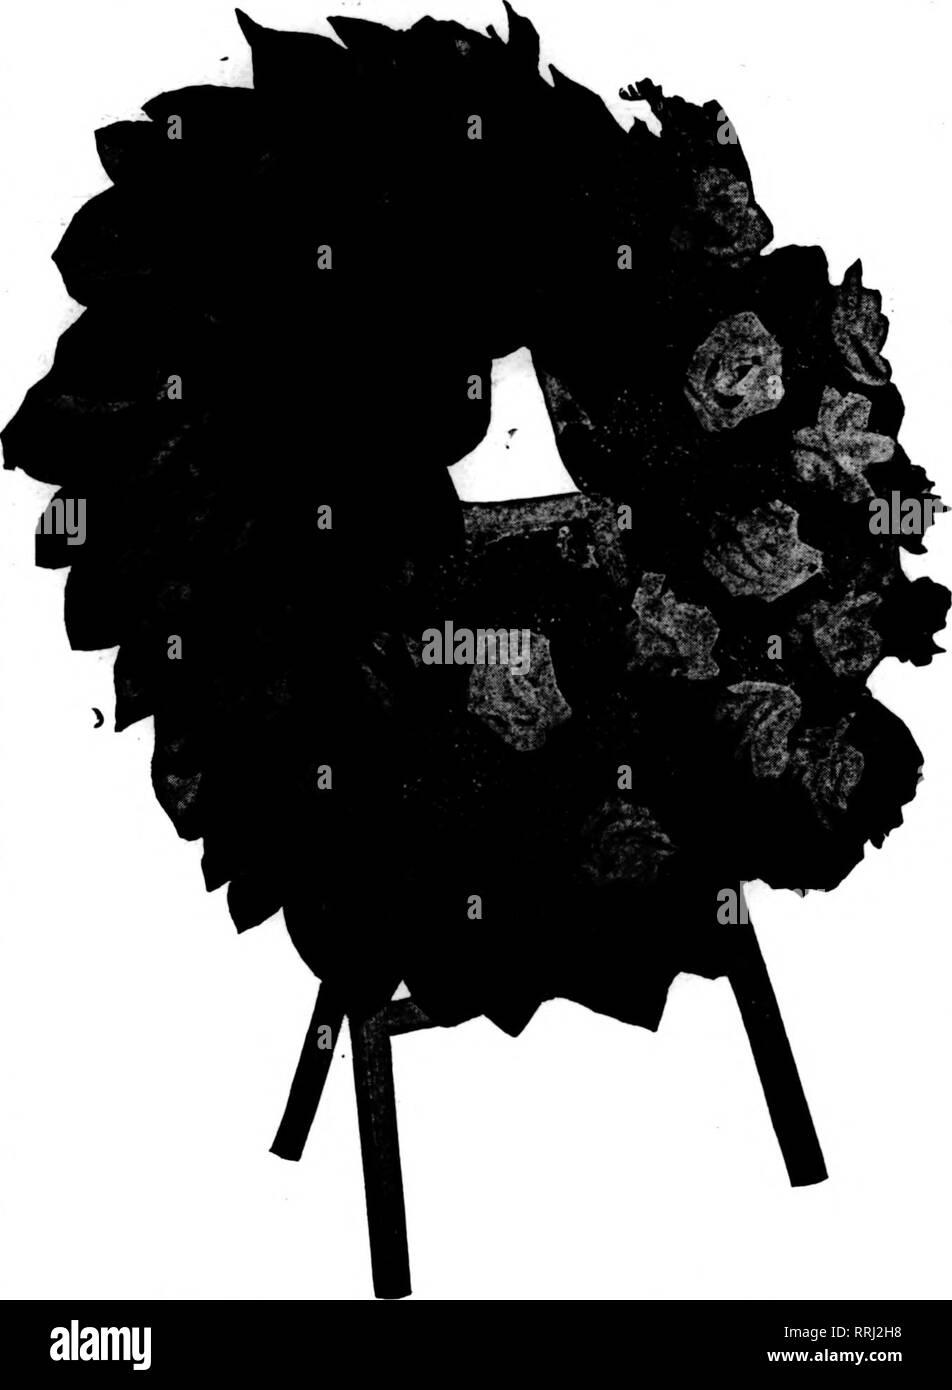 Doa Black and White Stock Photos & Images - Alamy